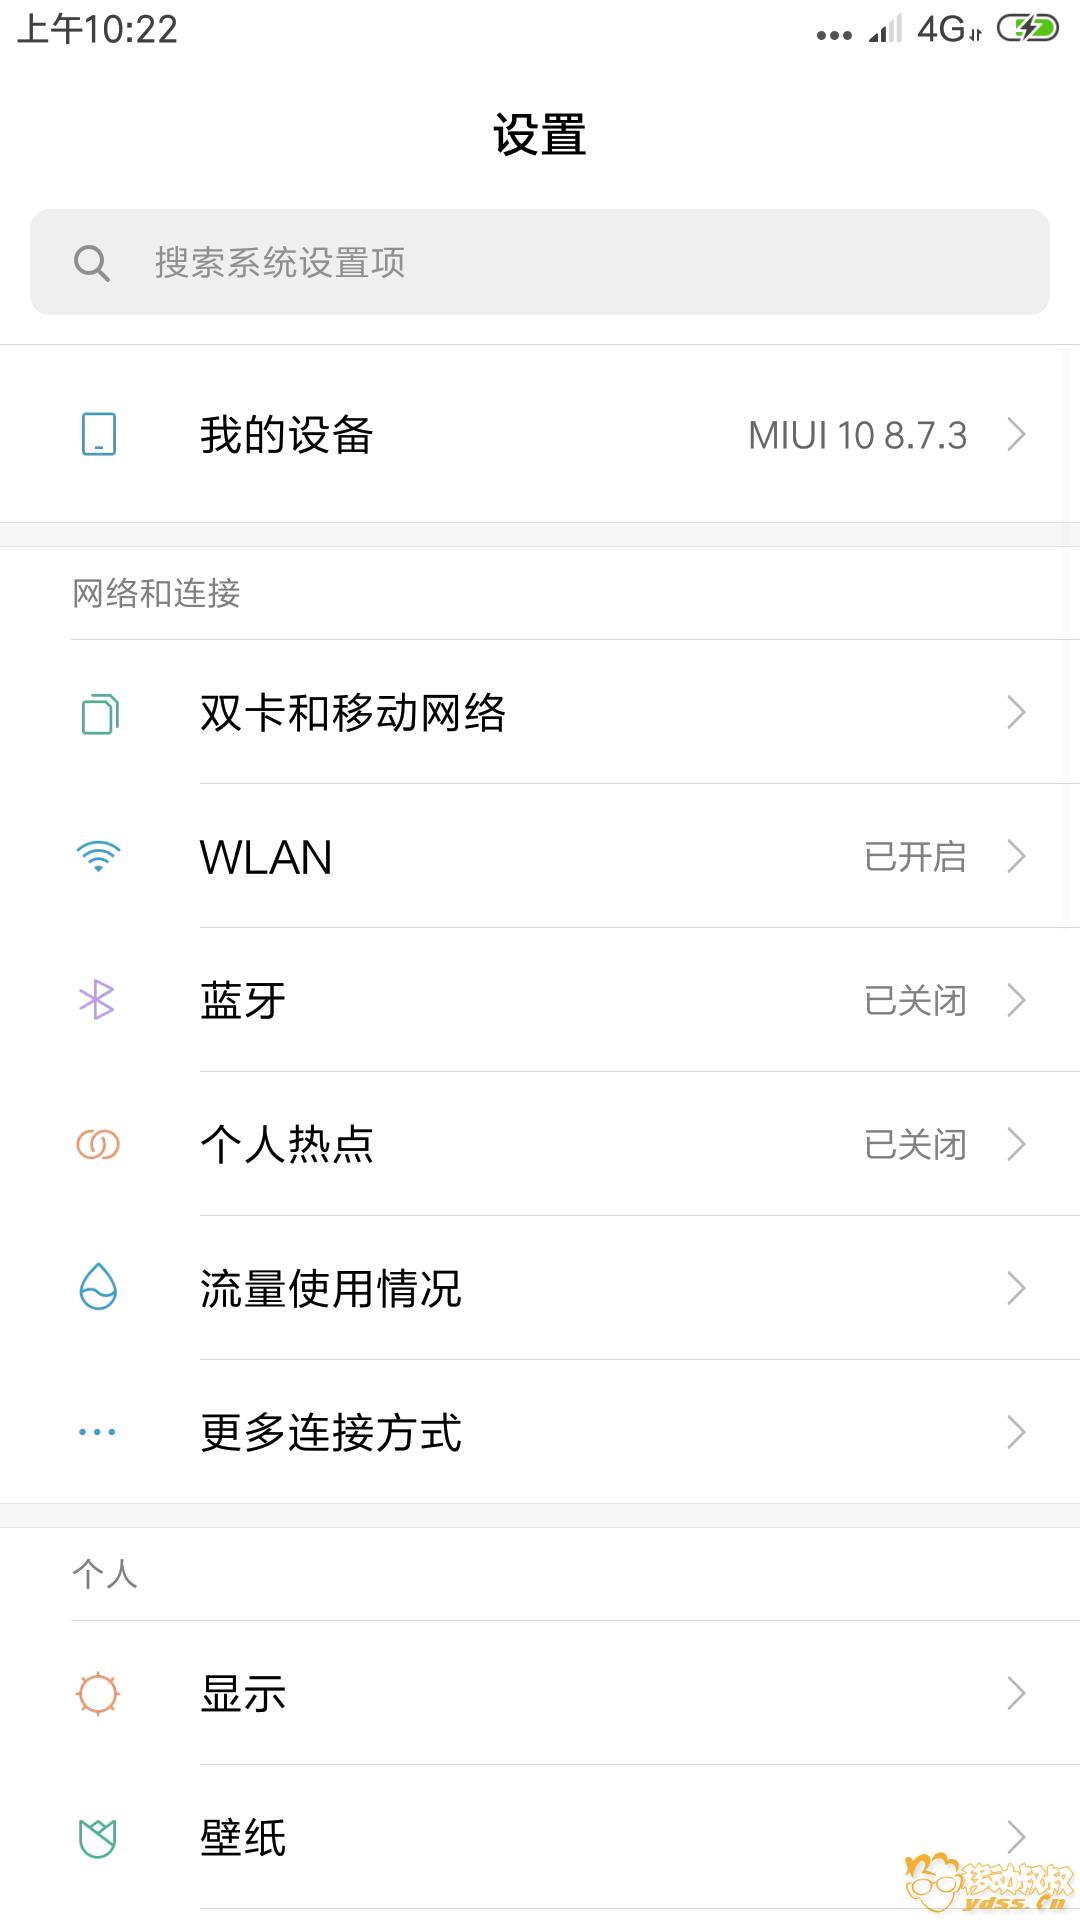 Screenshot_2018-07-04-10-22-02-269_com.lbe.security.miui.png